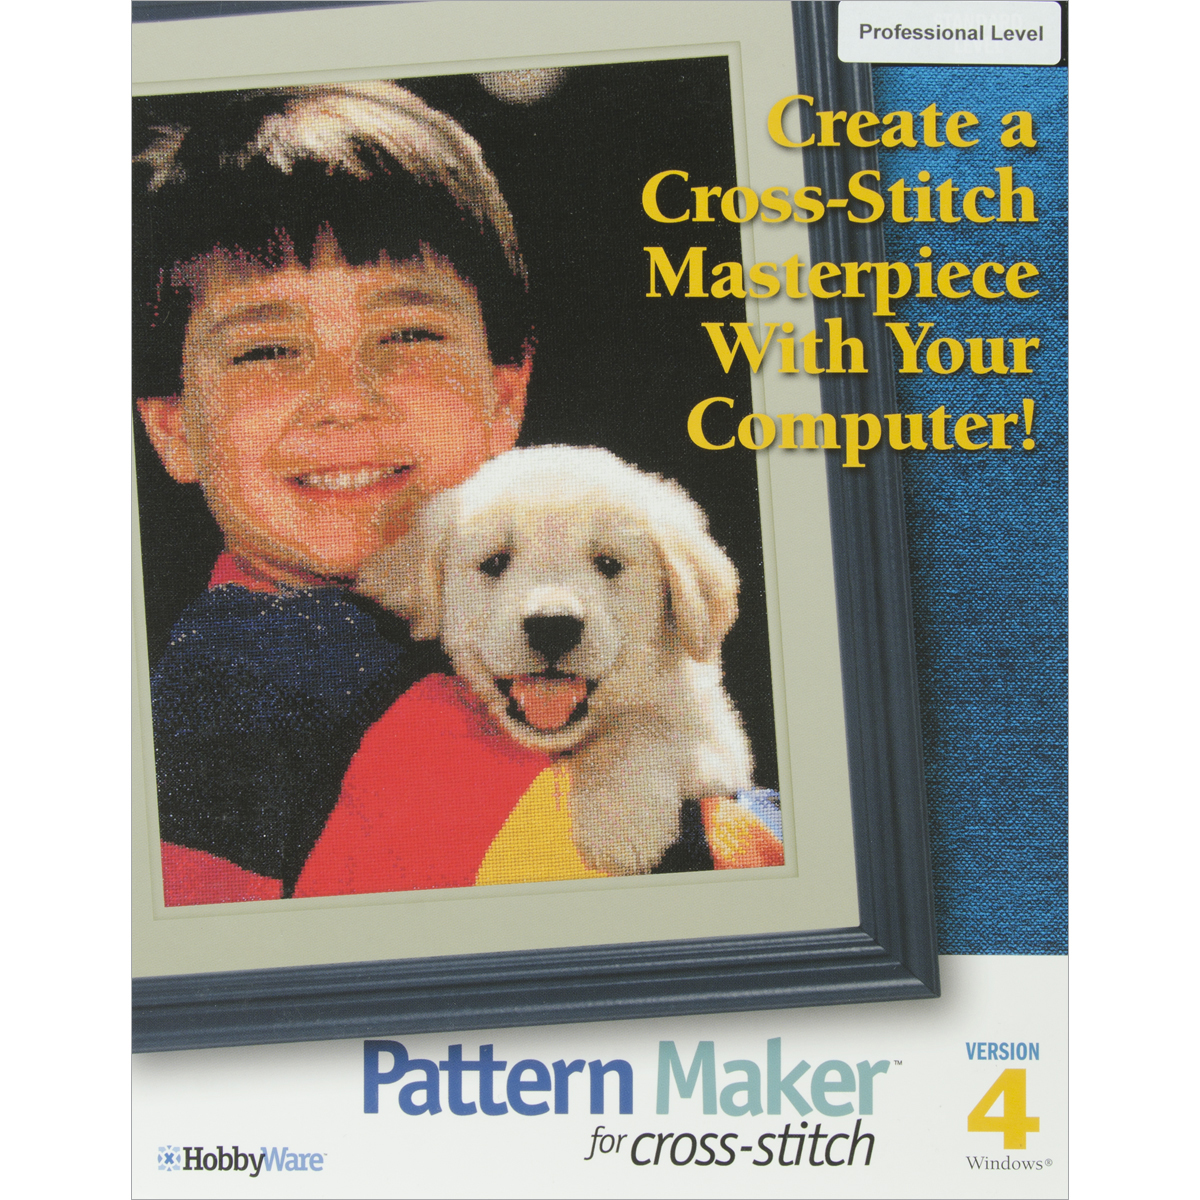 Pattern Maker Cross Stitch Software, Professional Version